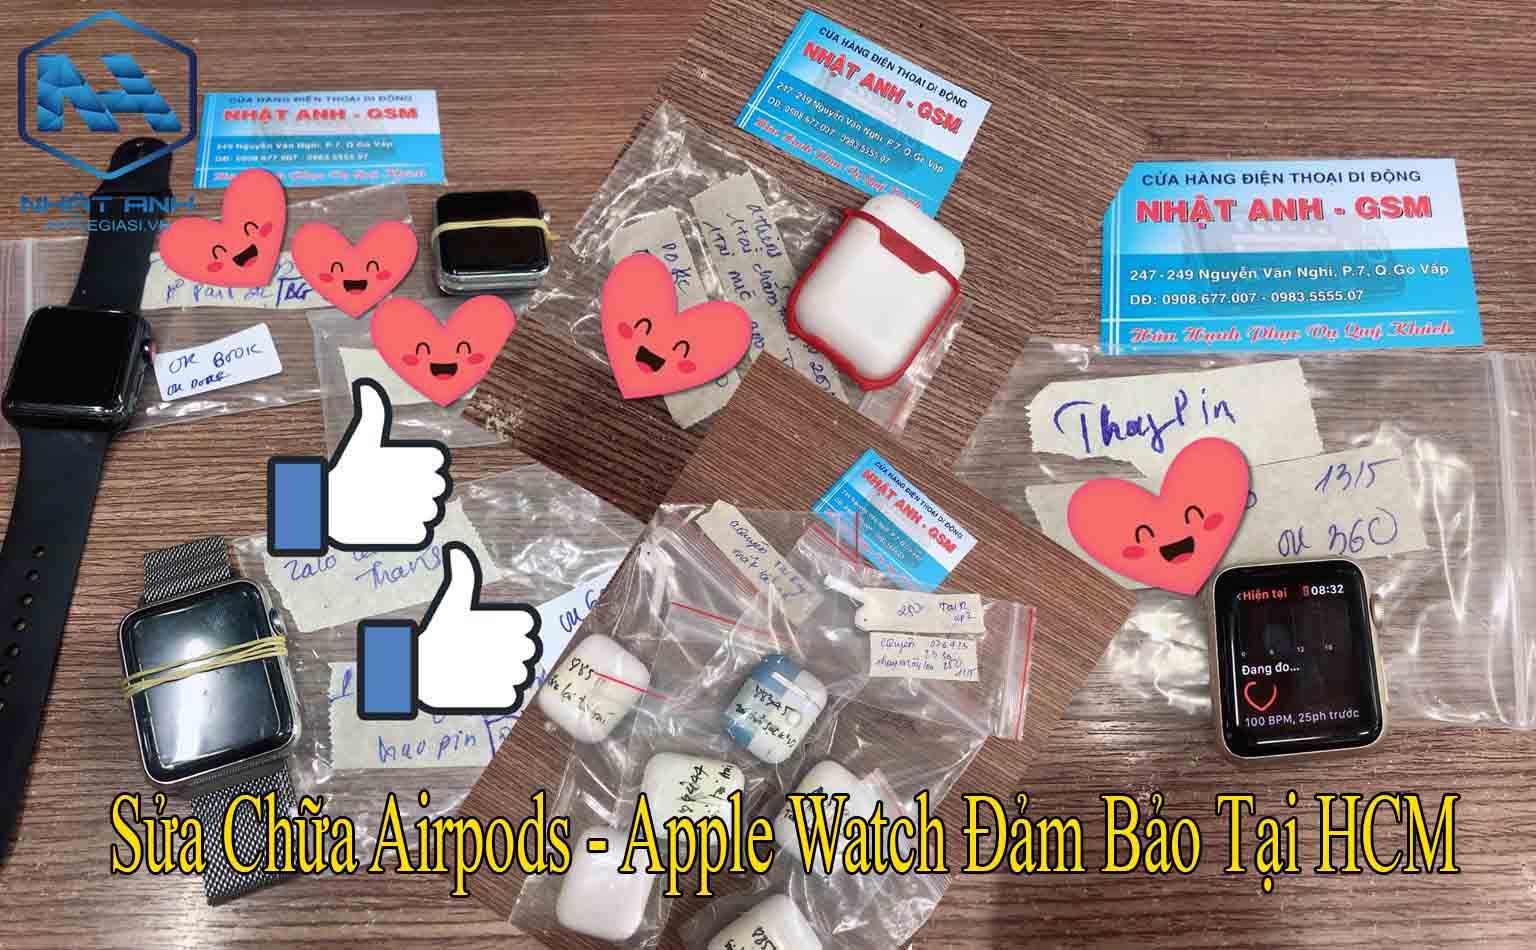 sửa chữa airpods apple watch